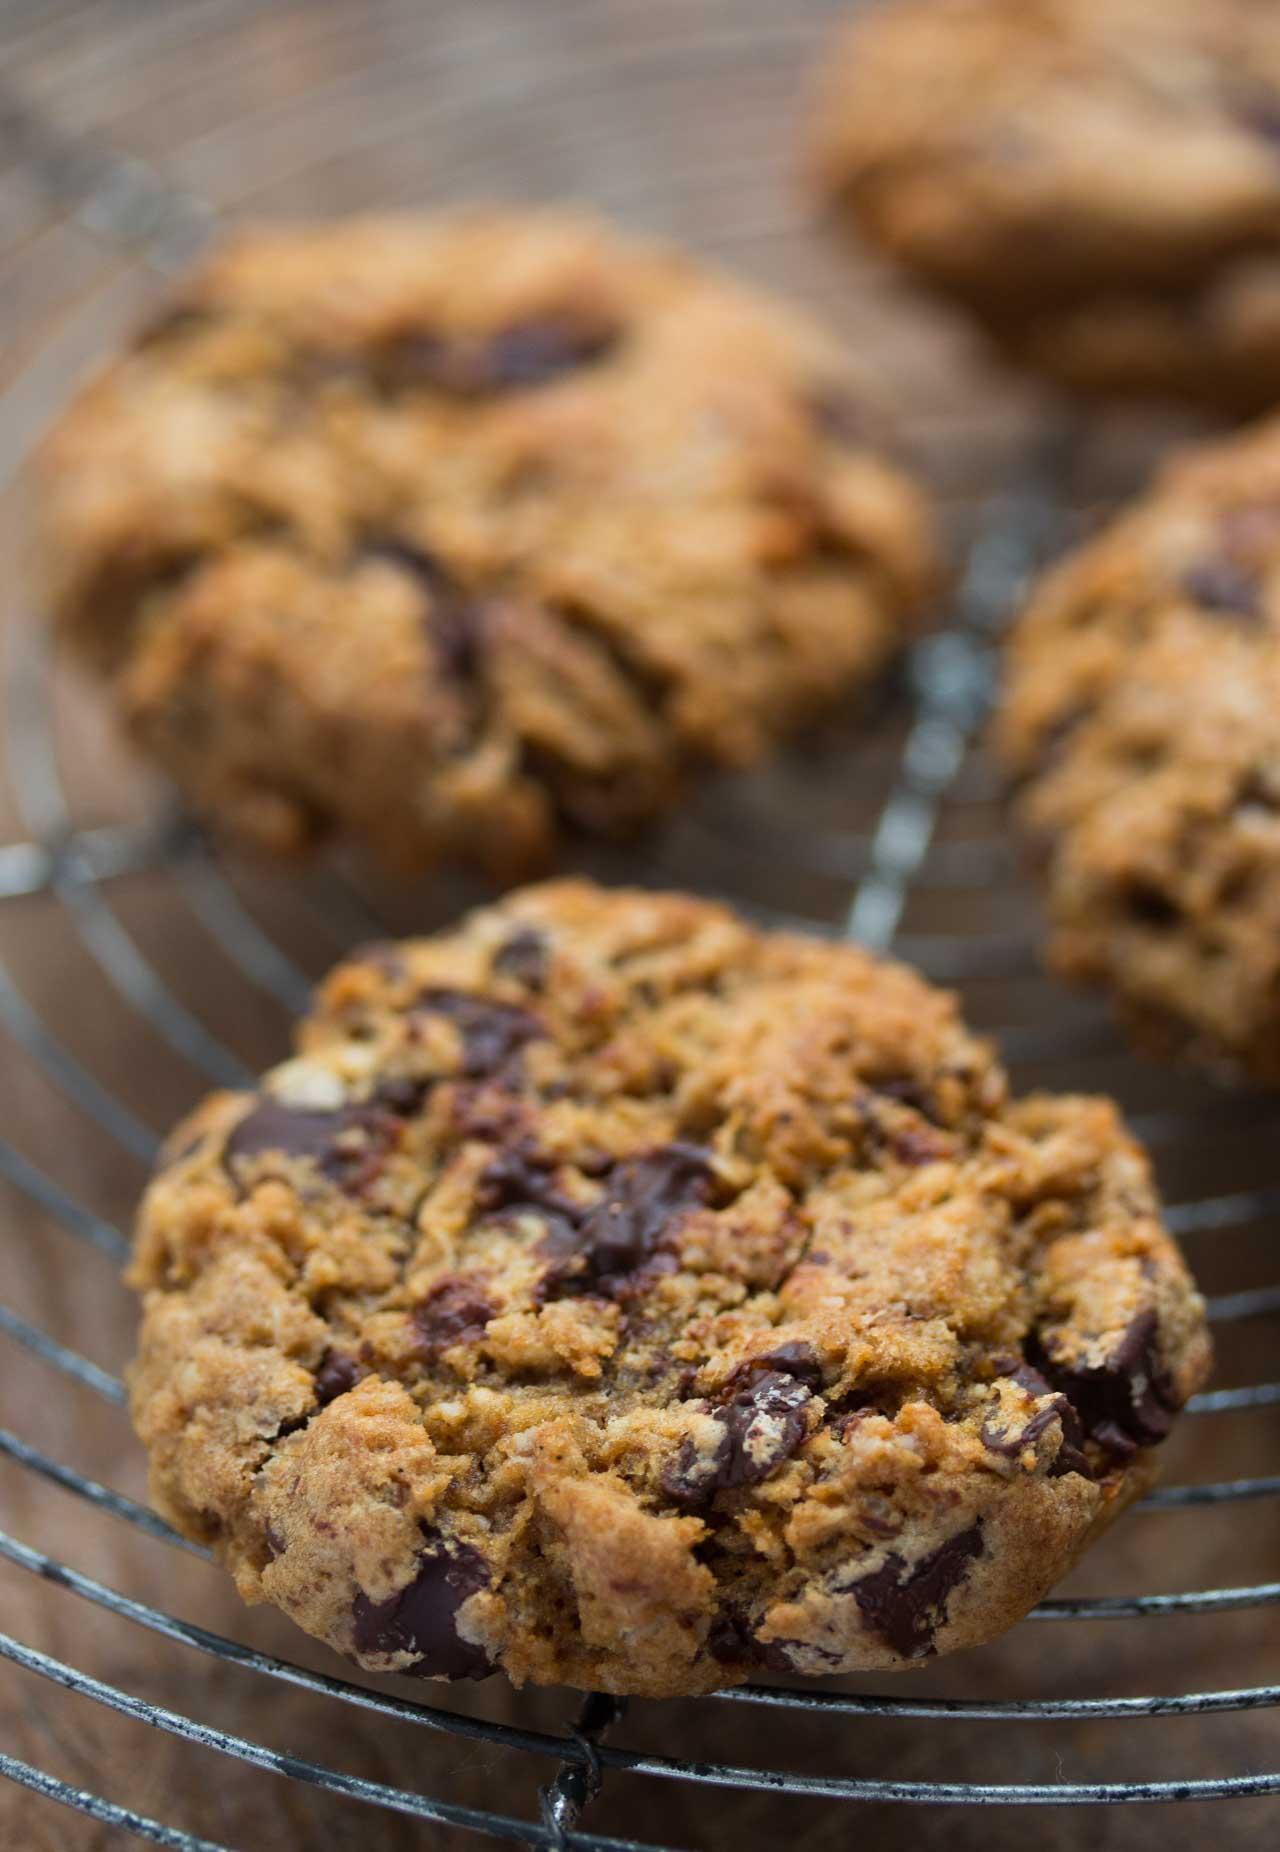 Mesquite Chocolate Chip Cookies